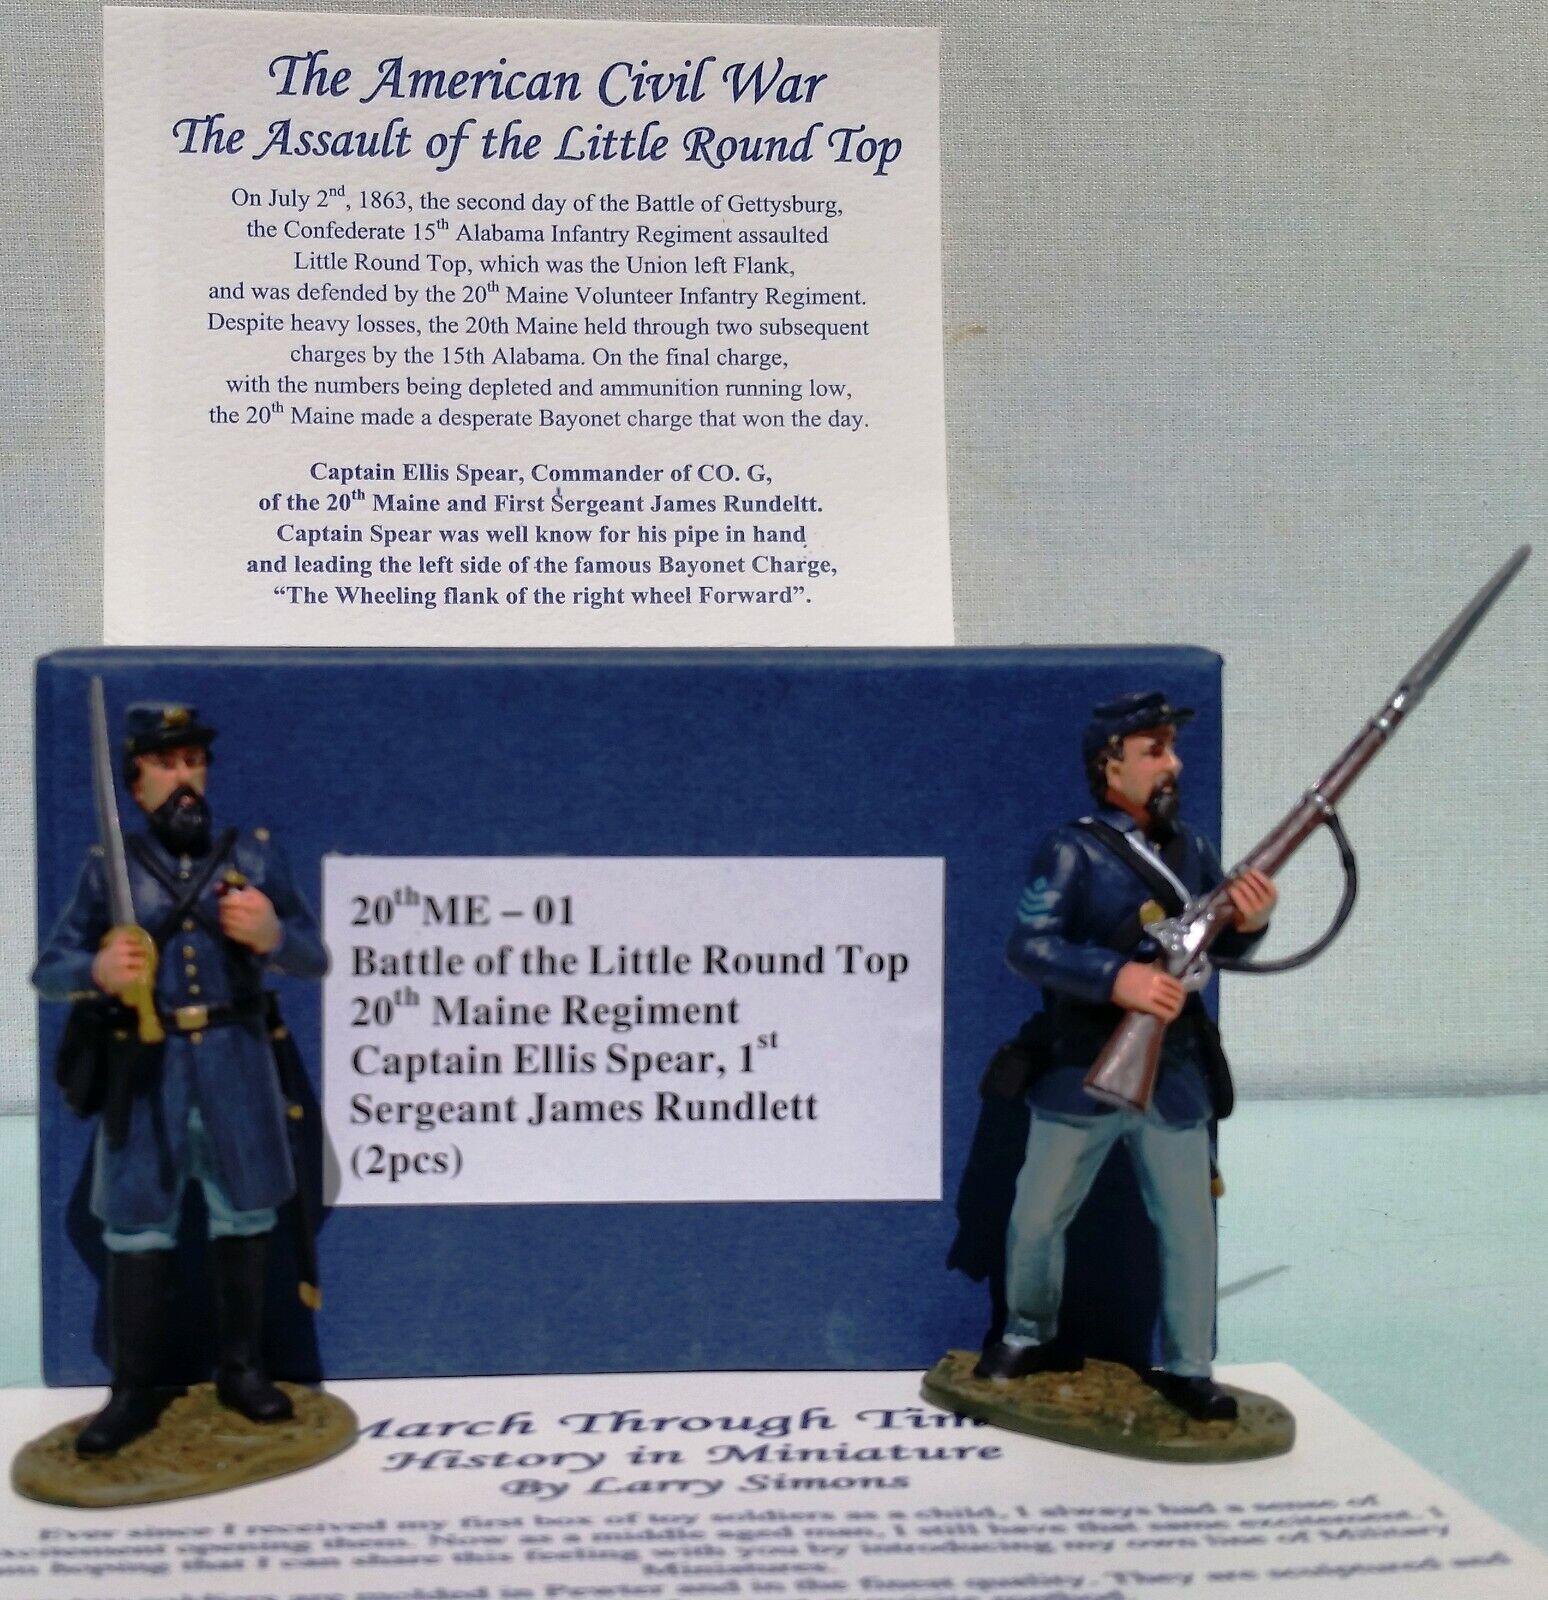 MARCH THROUGH TIMES CIVIL WAR ME-01 20TH MAINE CAPT. SPEAR & 1ST SERGEANT MIB